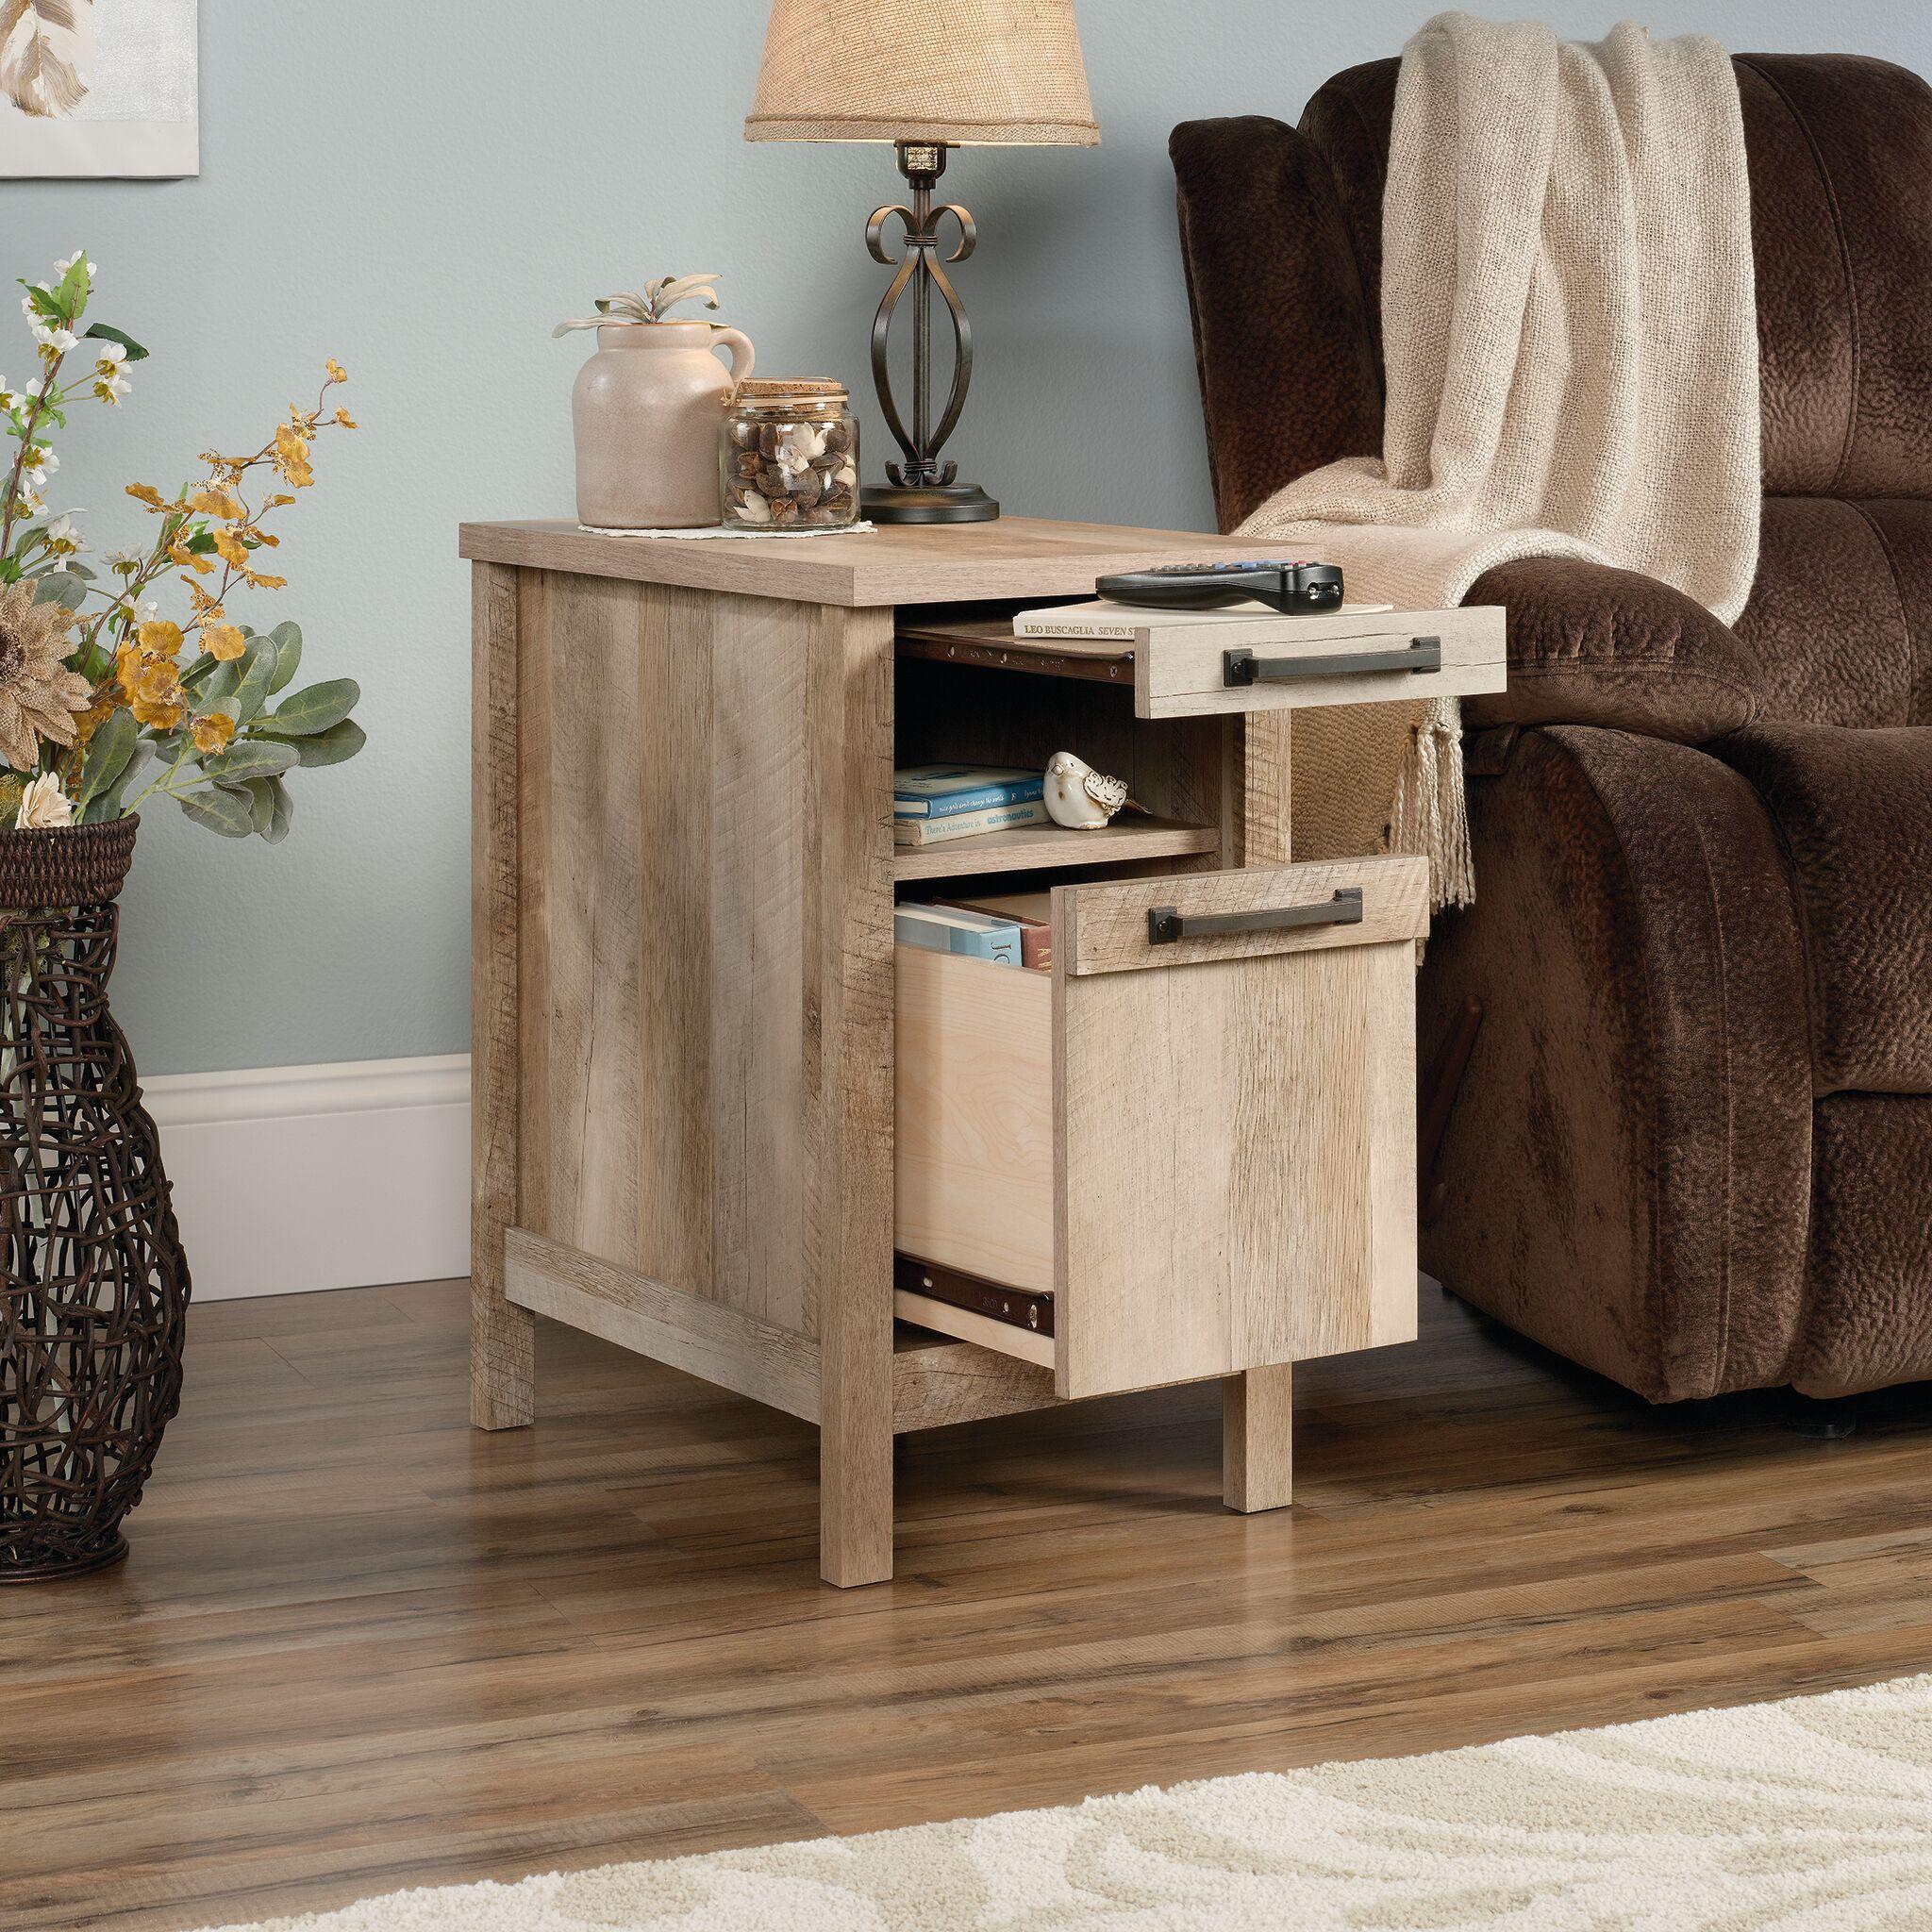 Tilden End Table With Storage Finish: Lintel oak